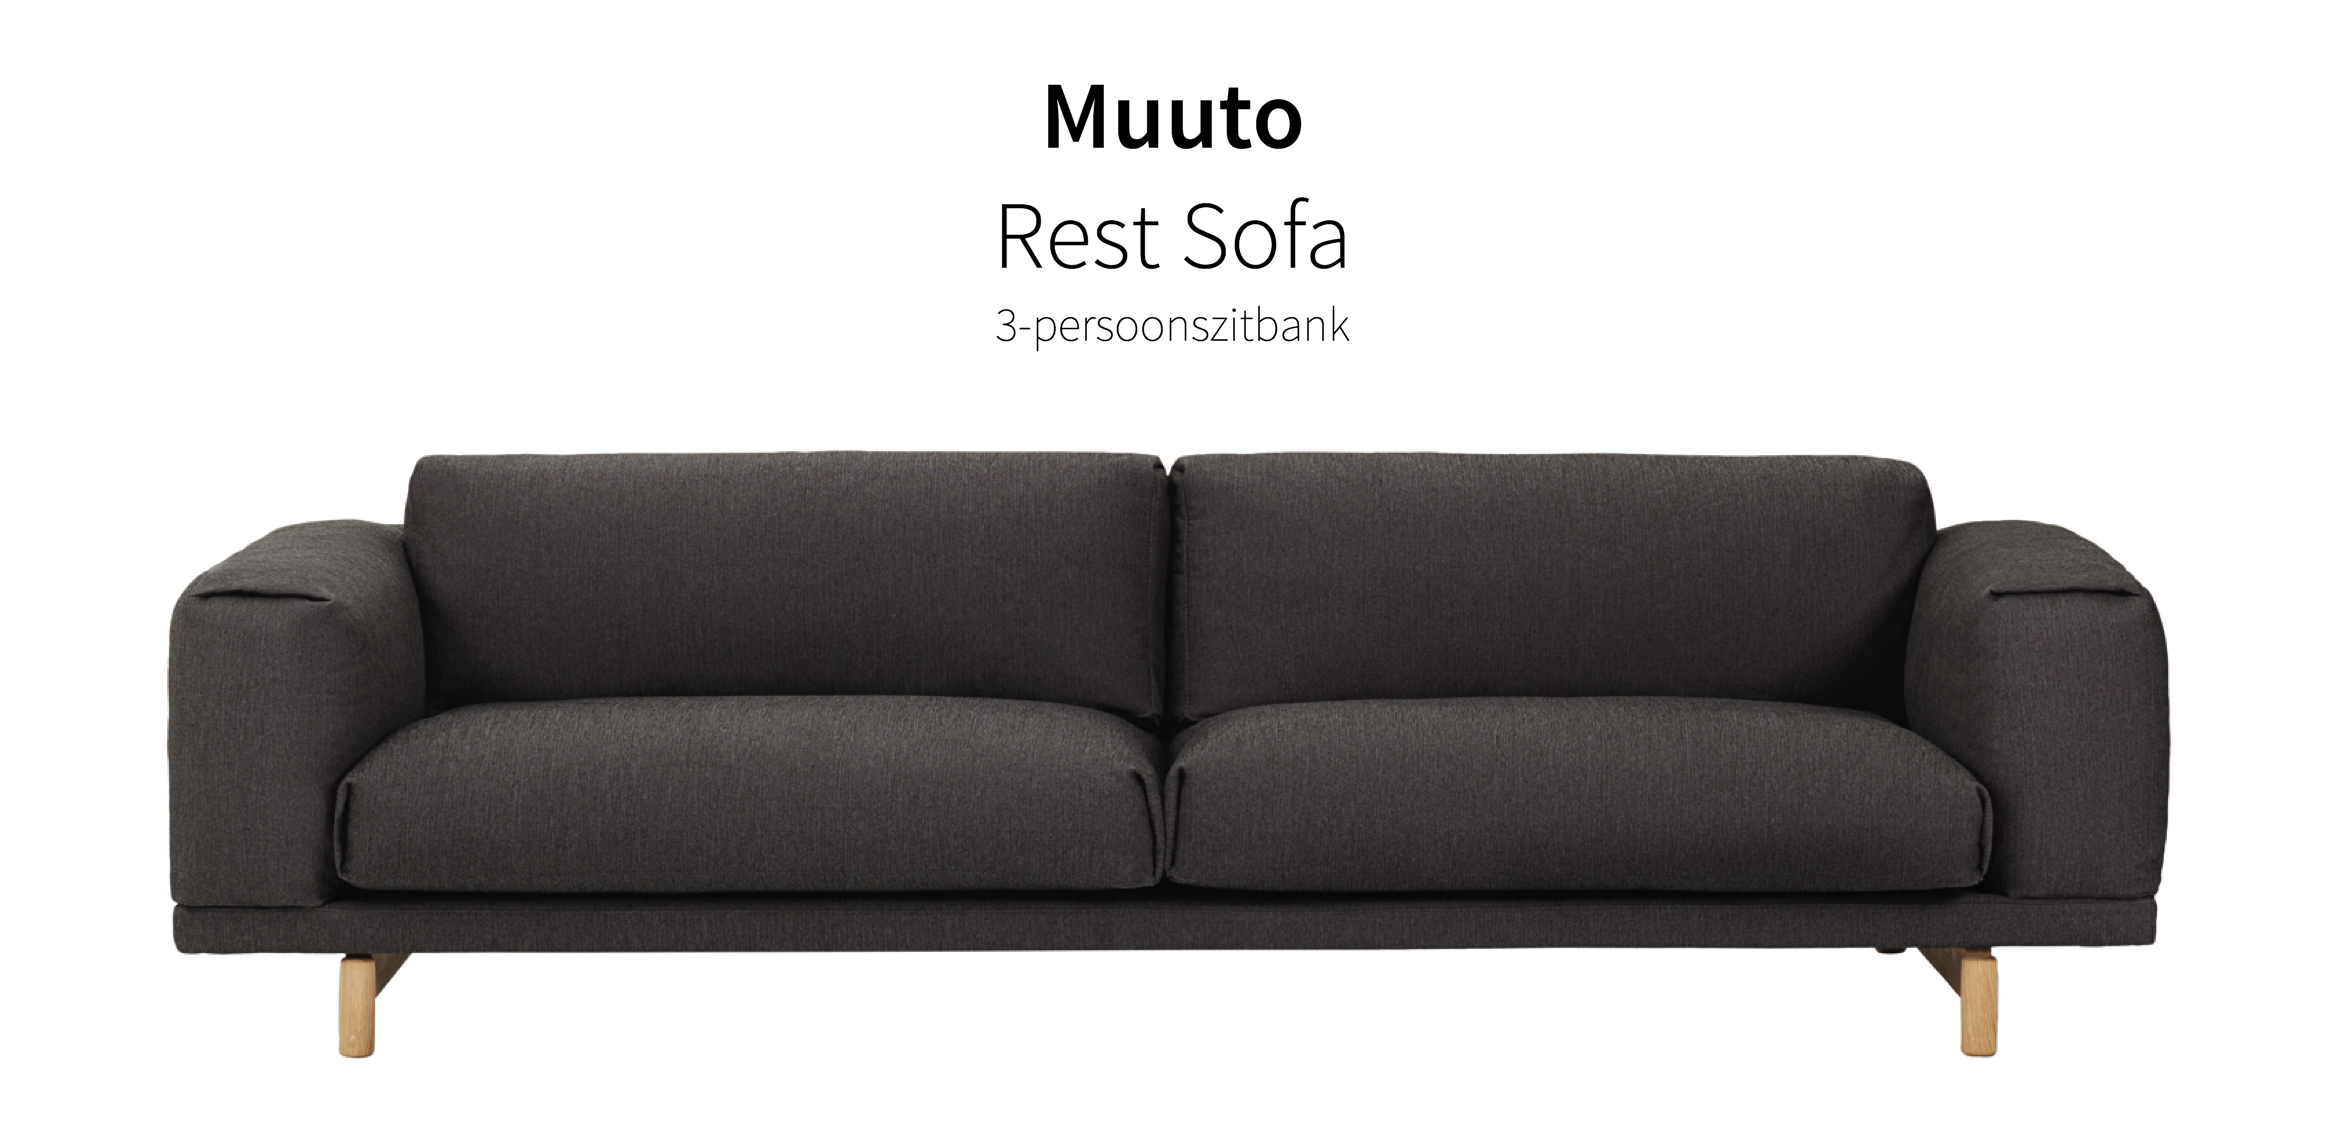 muuto rest sofa 3 zitsbank. Black Bedroom Furniture Sets. Home Design Ideas